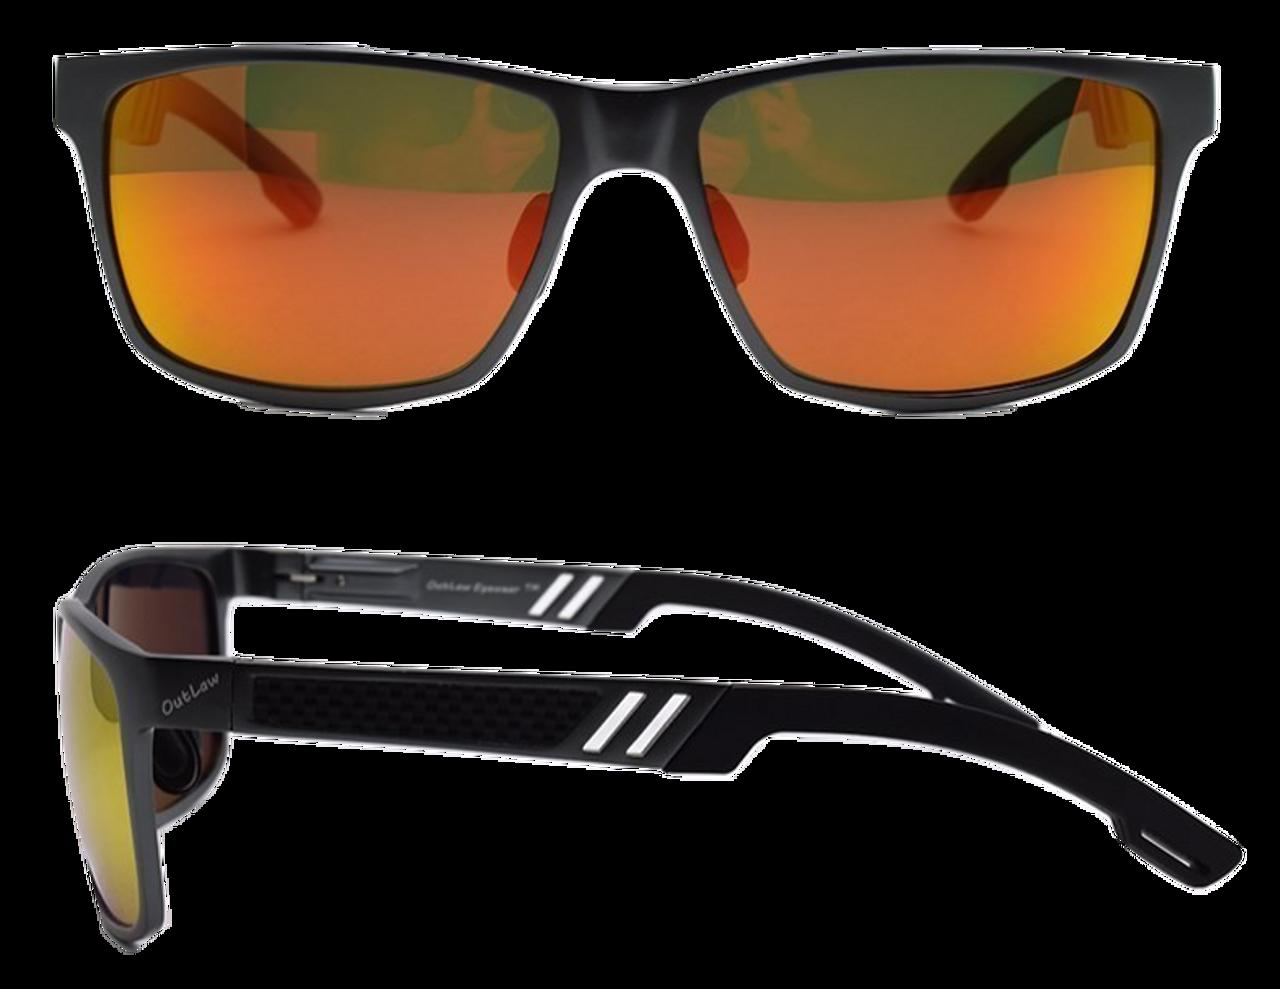 fccb6e8801 Wayfarer Mg Black Sunglass frame with Sunburst Polarized lenses ...